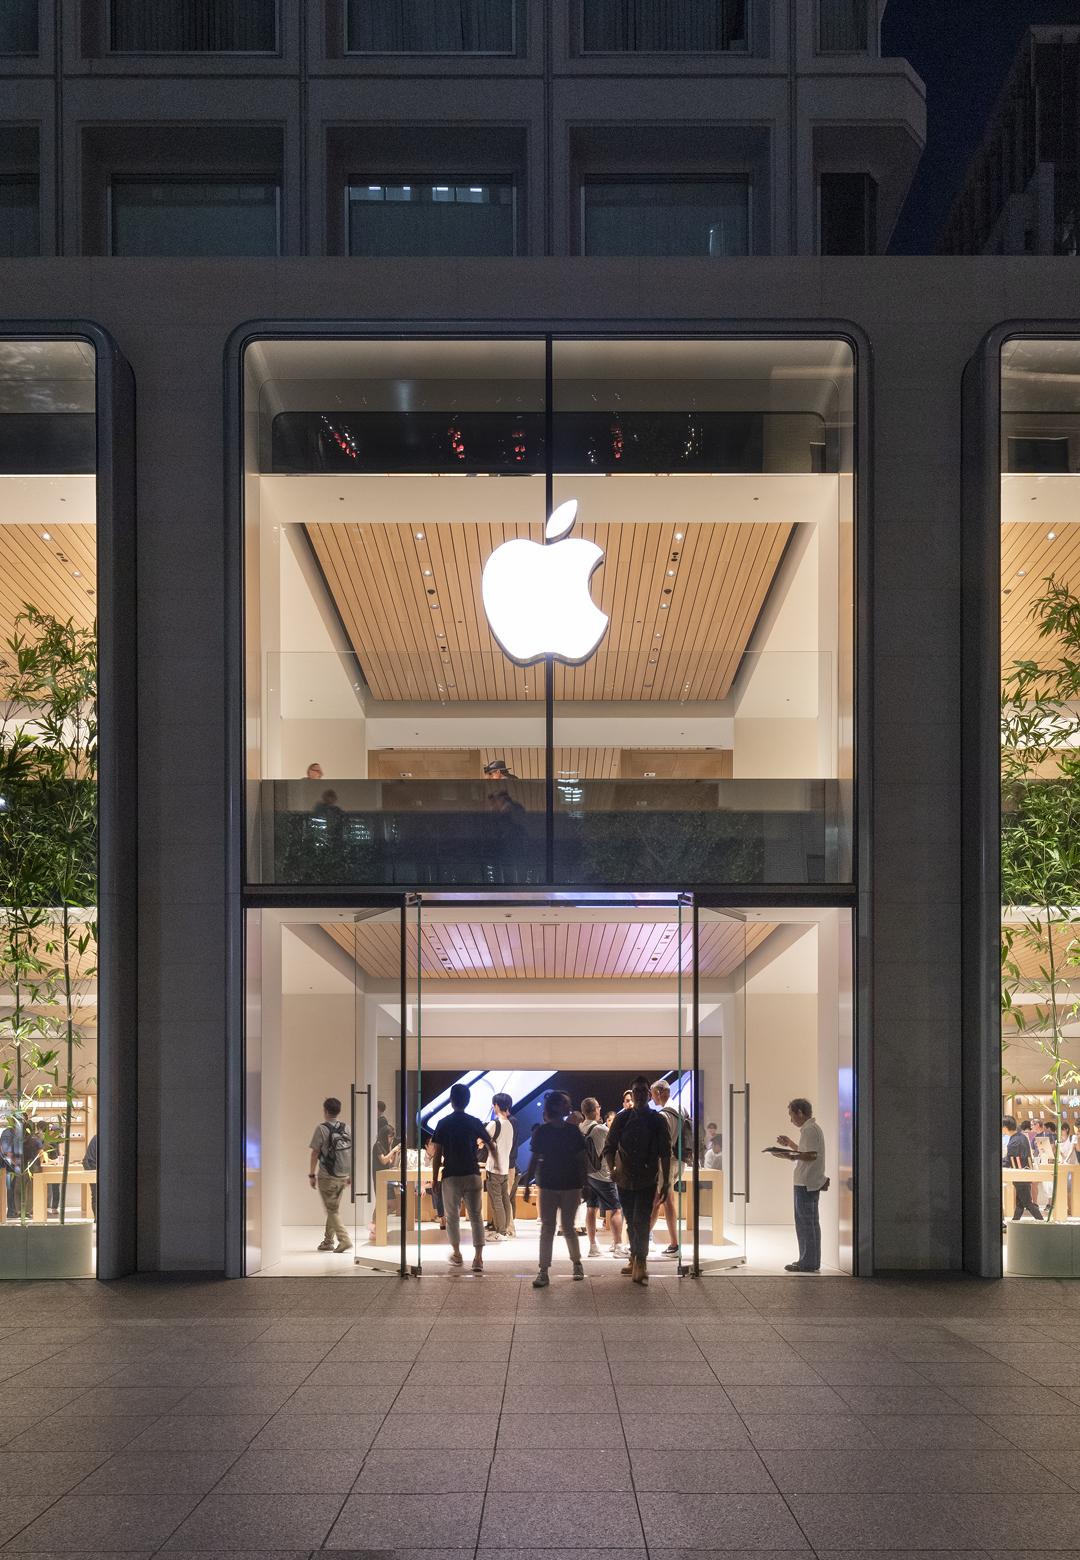 Apple Marunouchi in Tokyo, Japan designed by Foster + Partners | Apple Marunouchi | Foster + Partners | STIR